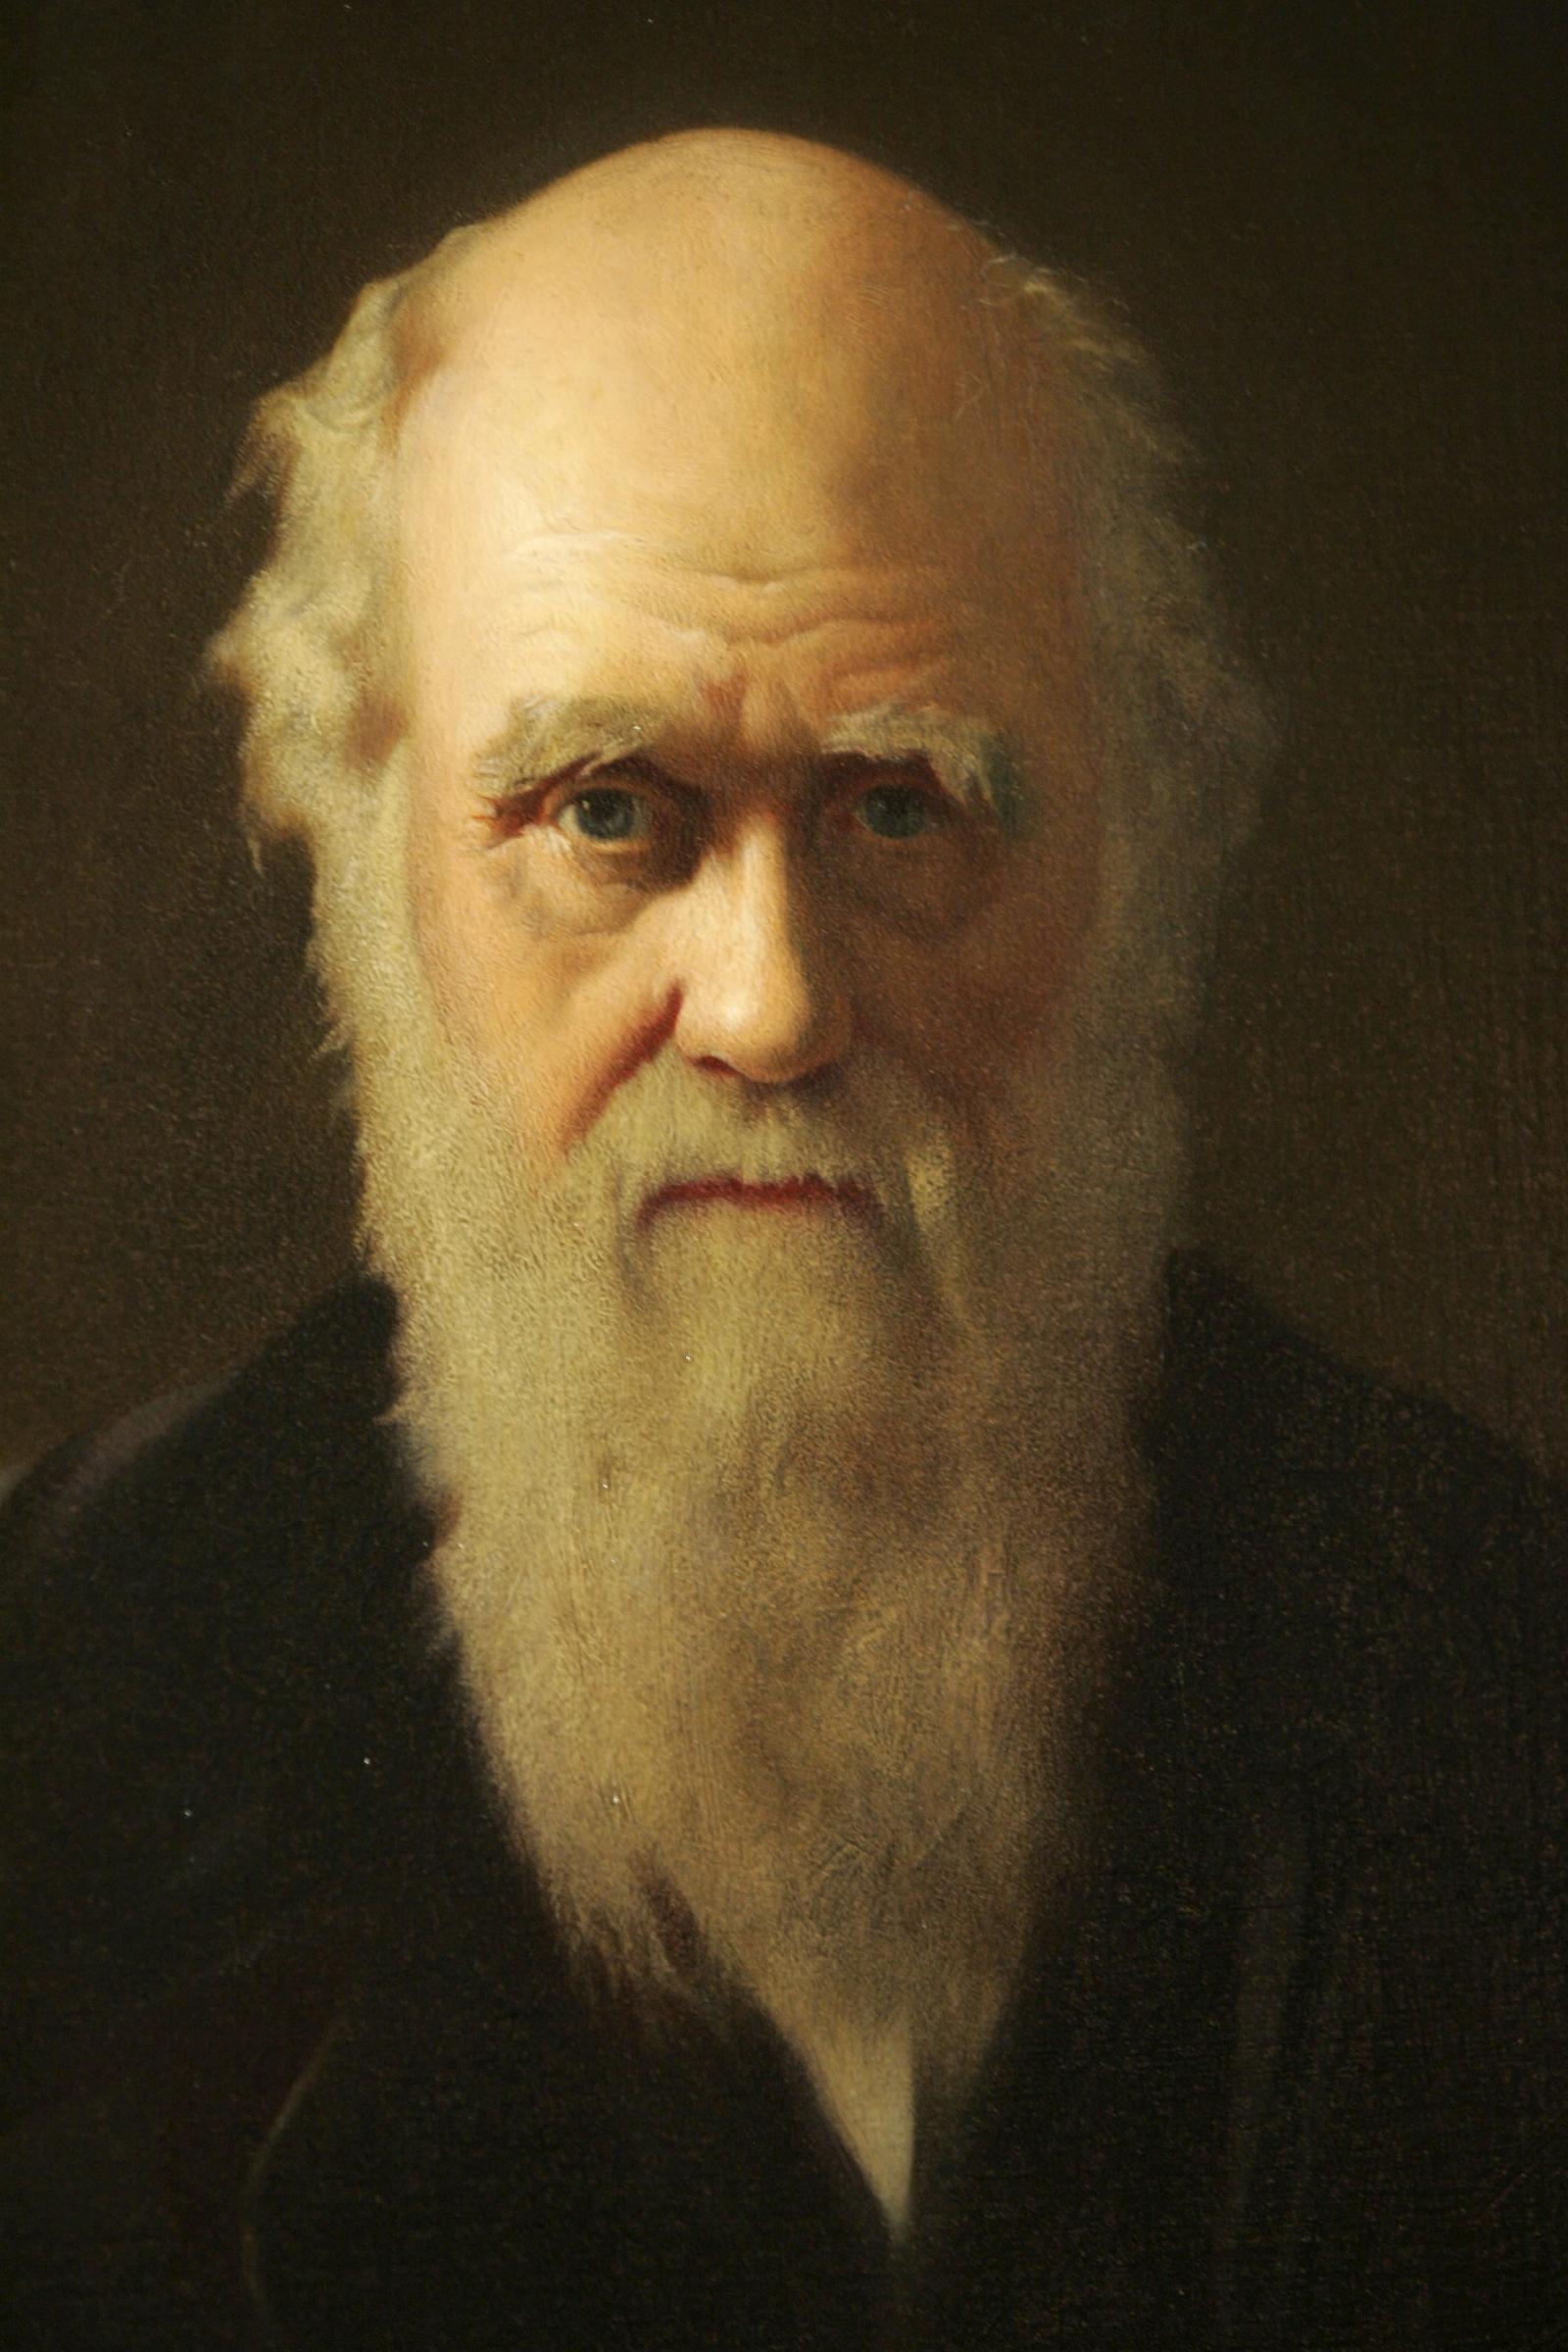 A portrait of Charles Darwin